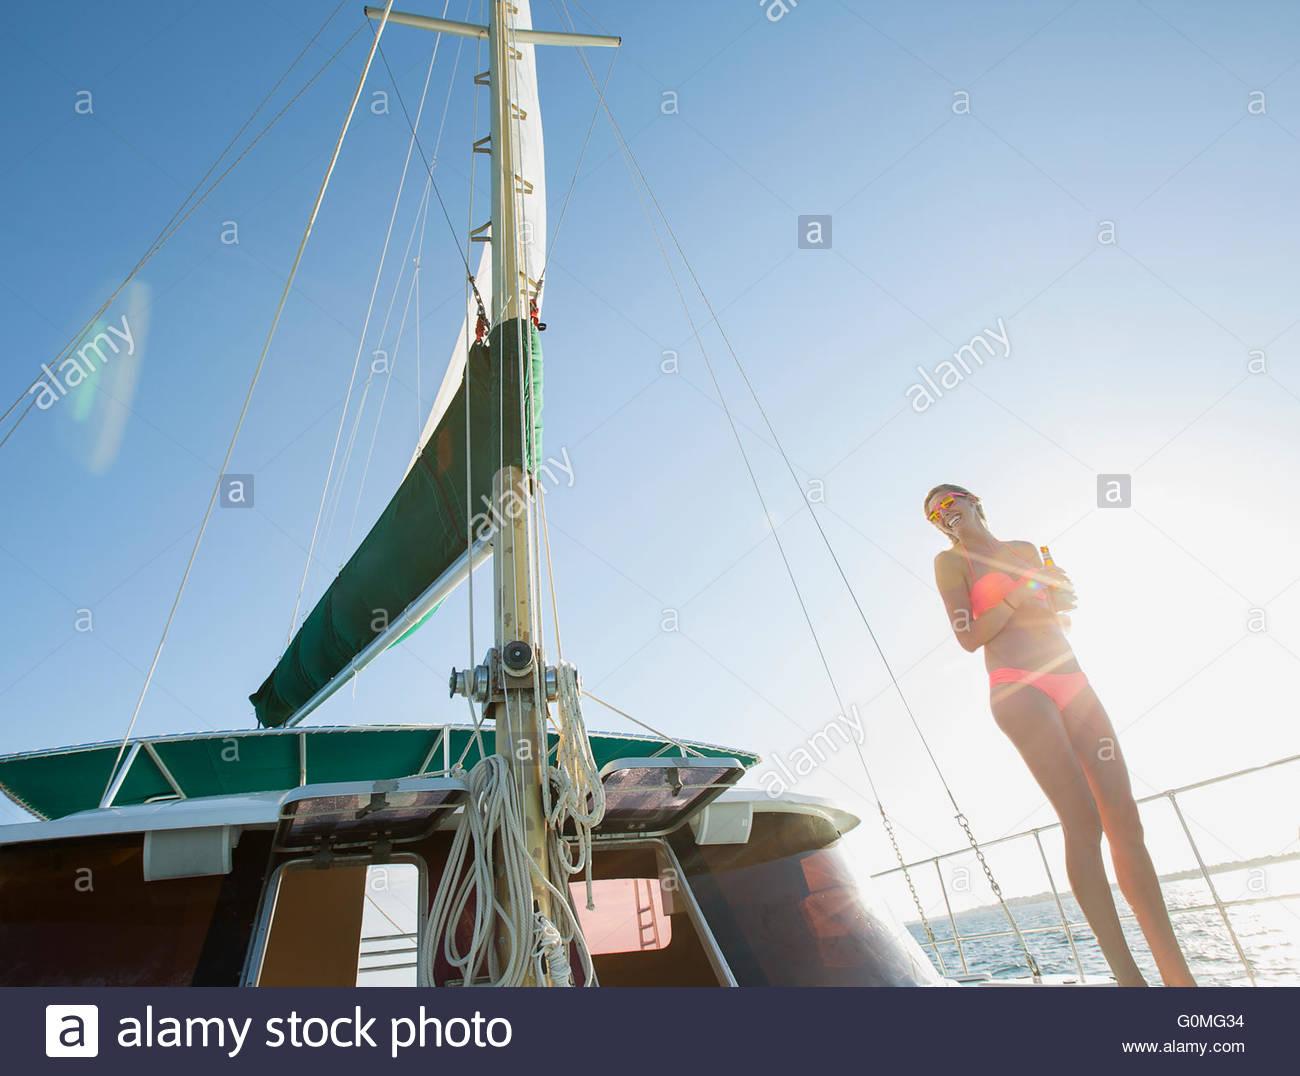 Woman in bikini on yacht under sunny blue sky - Stock Image